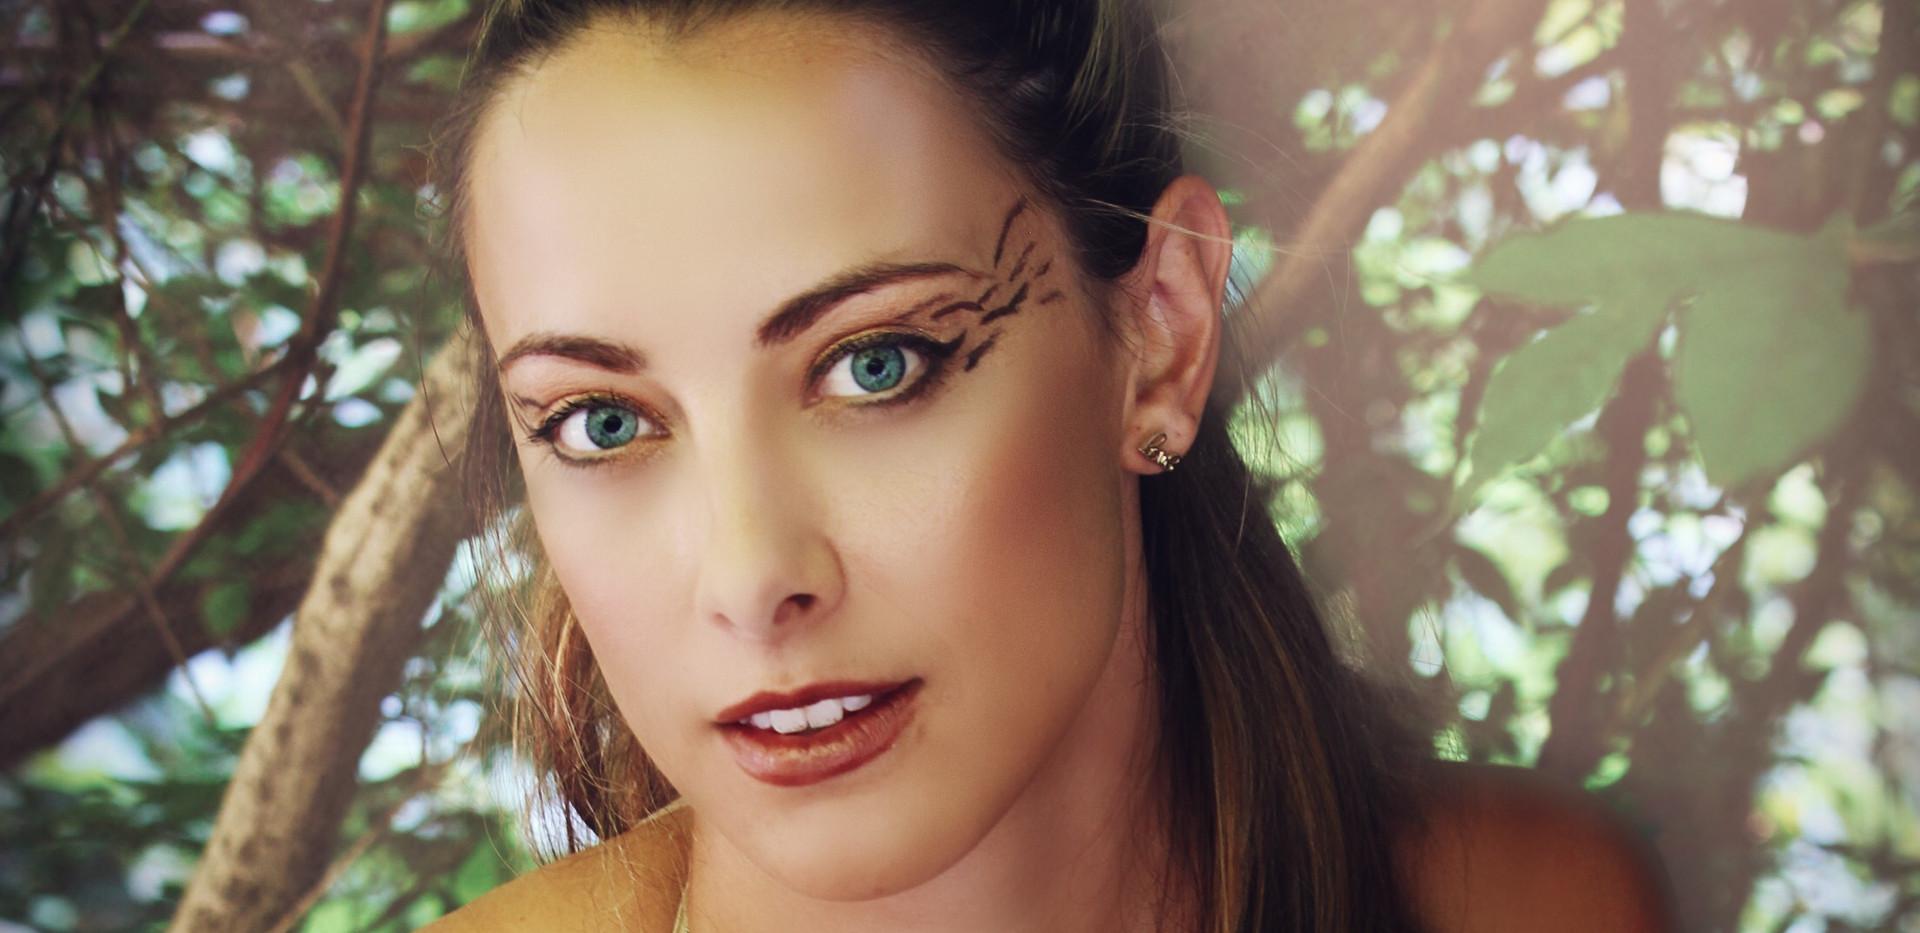 @daniellekwoka for August's Welcome to the Jungle Collab Photo: @mariannebphotography Makeup: @lipstickandmagictricks